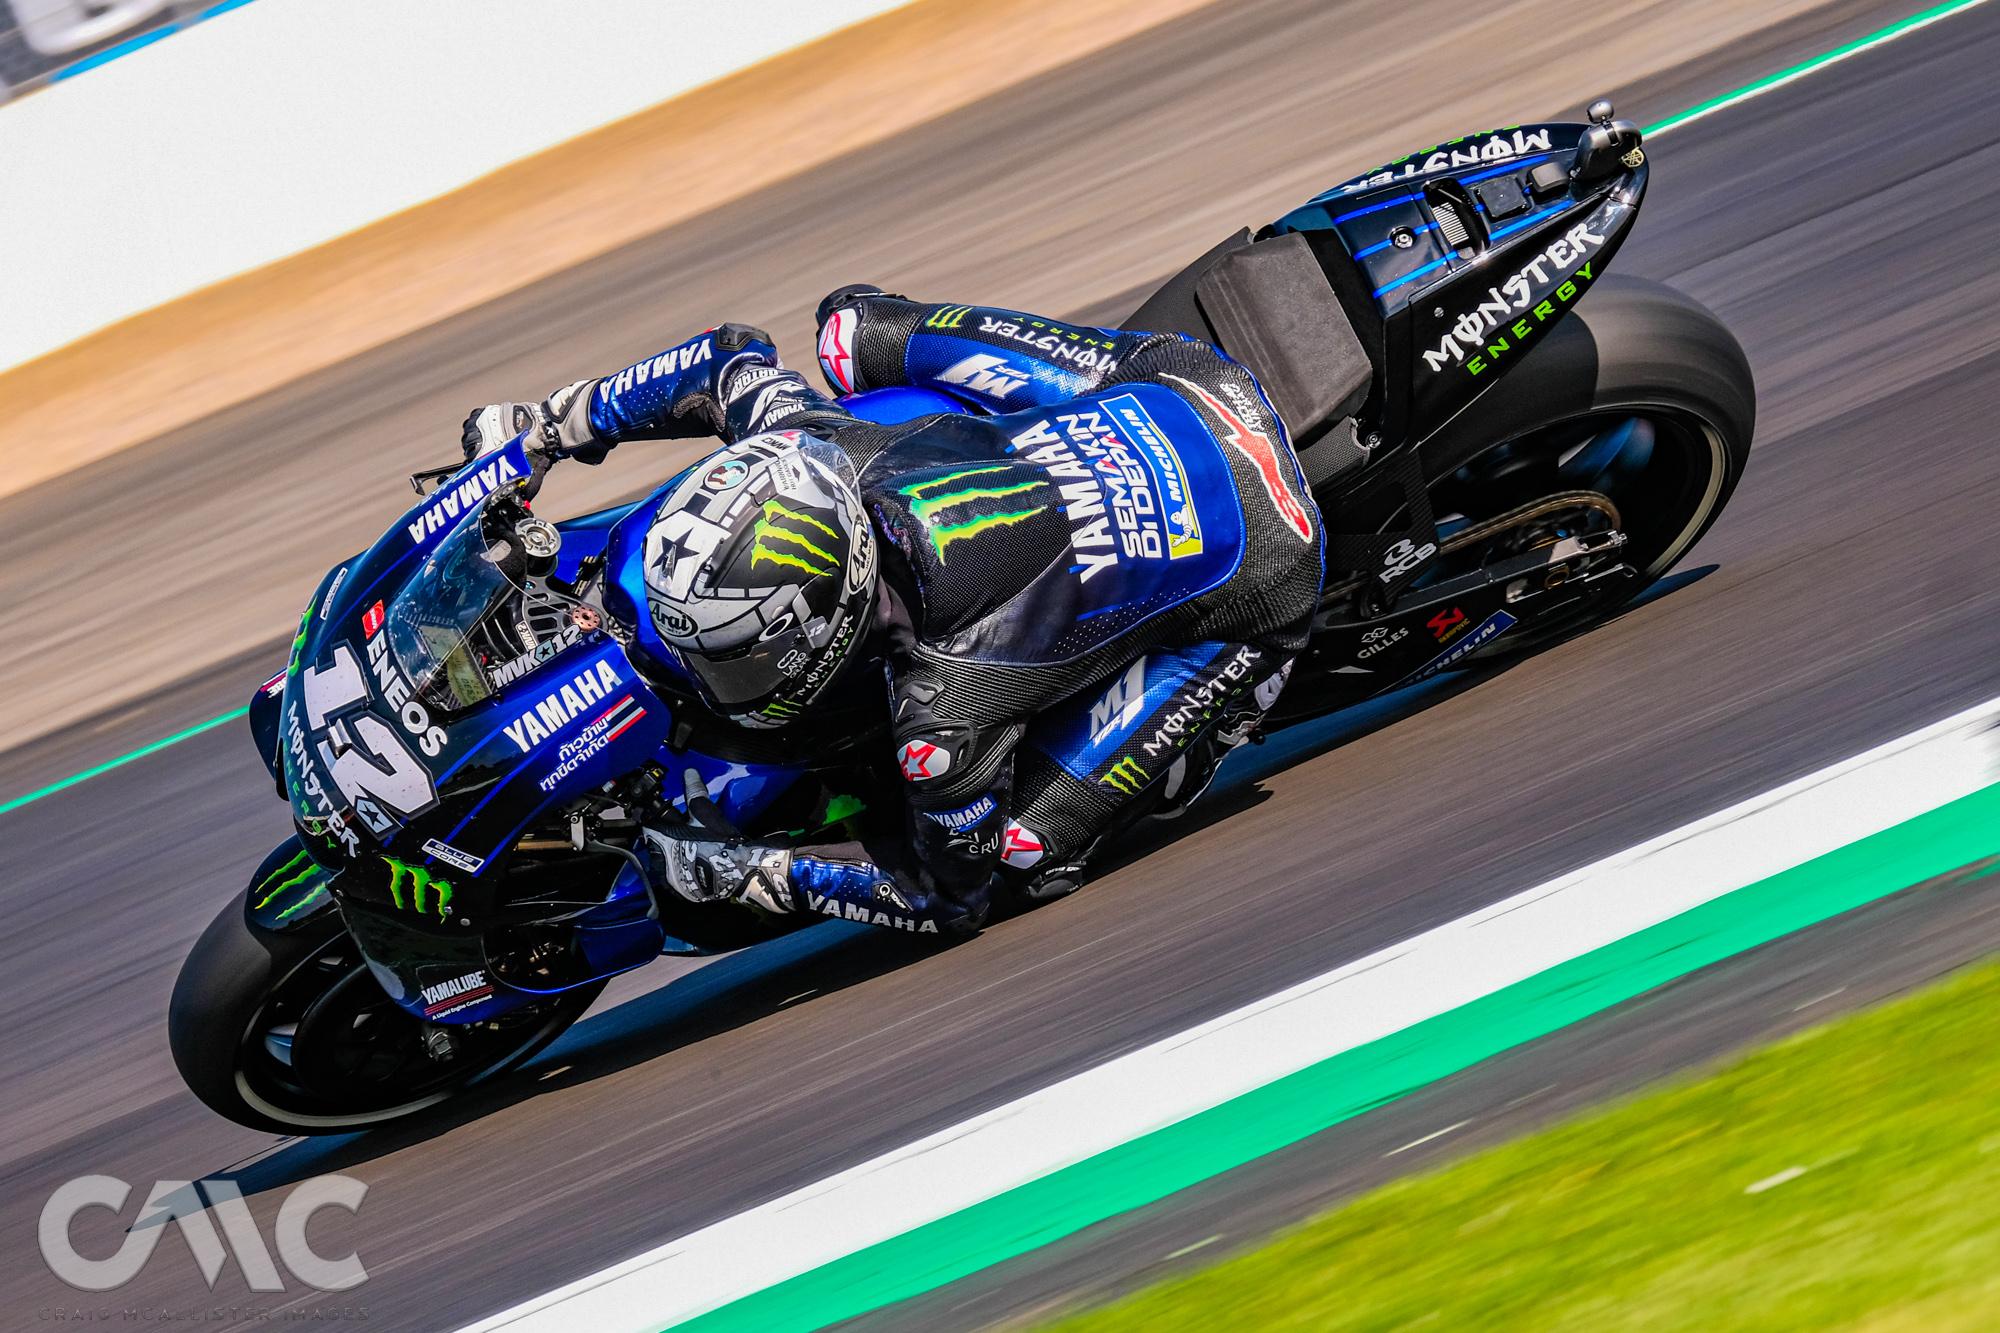 CMC_MotoGP_FP3_Silverstone 100-4004820.jpg